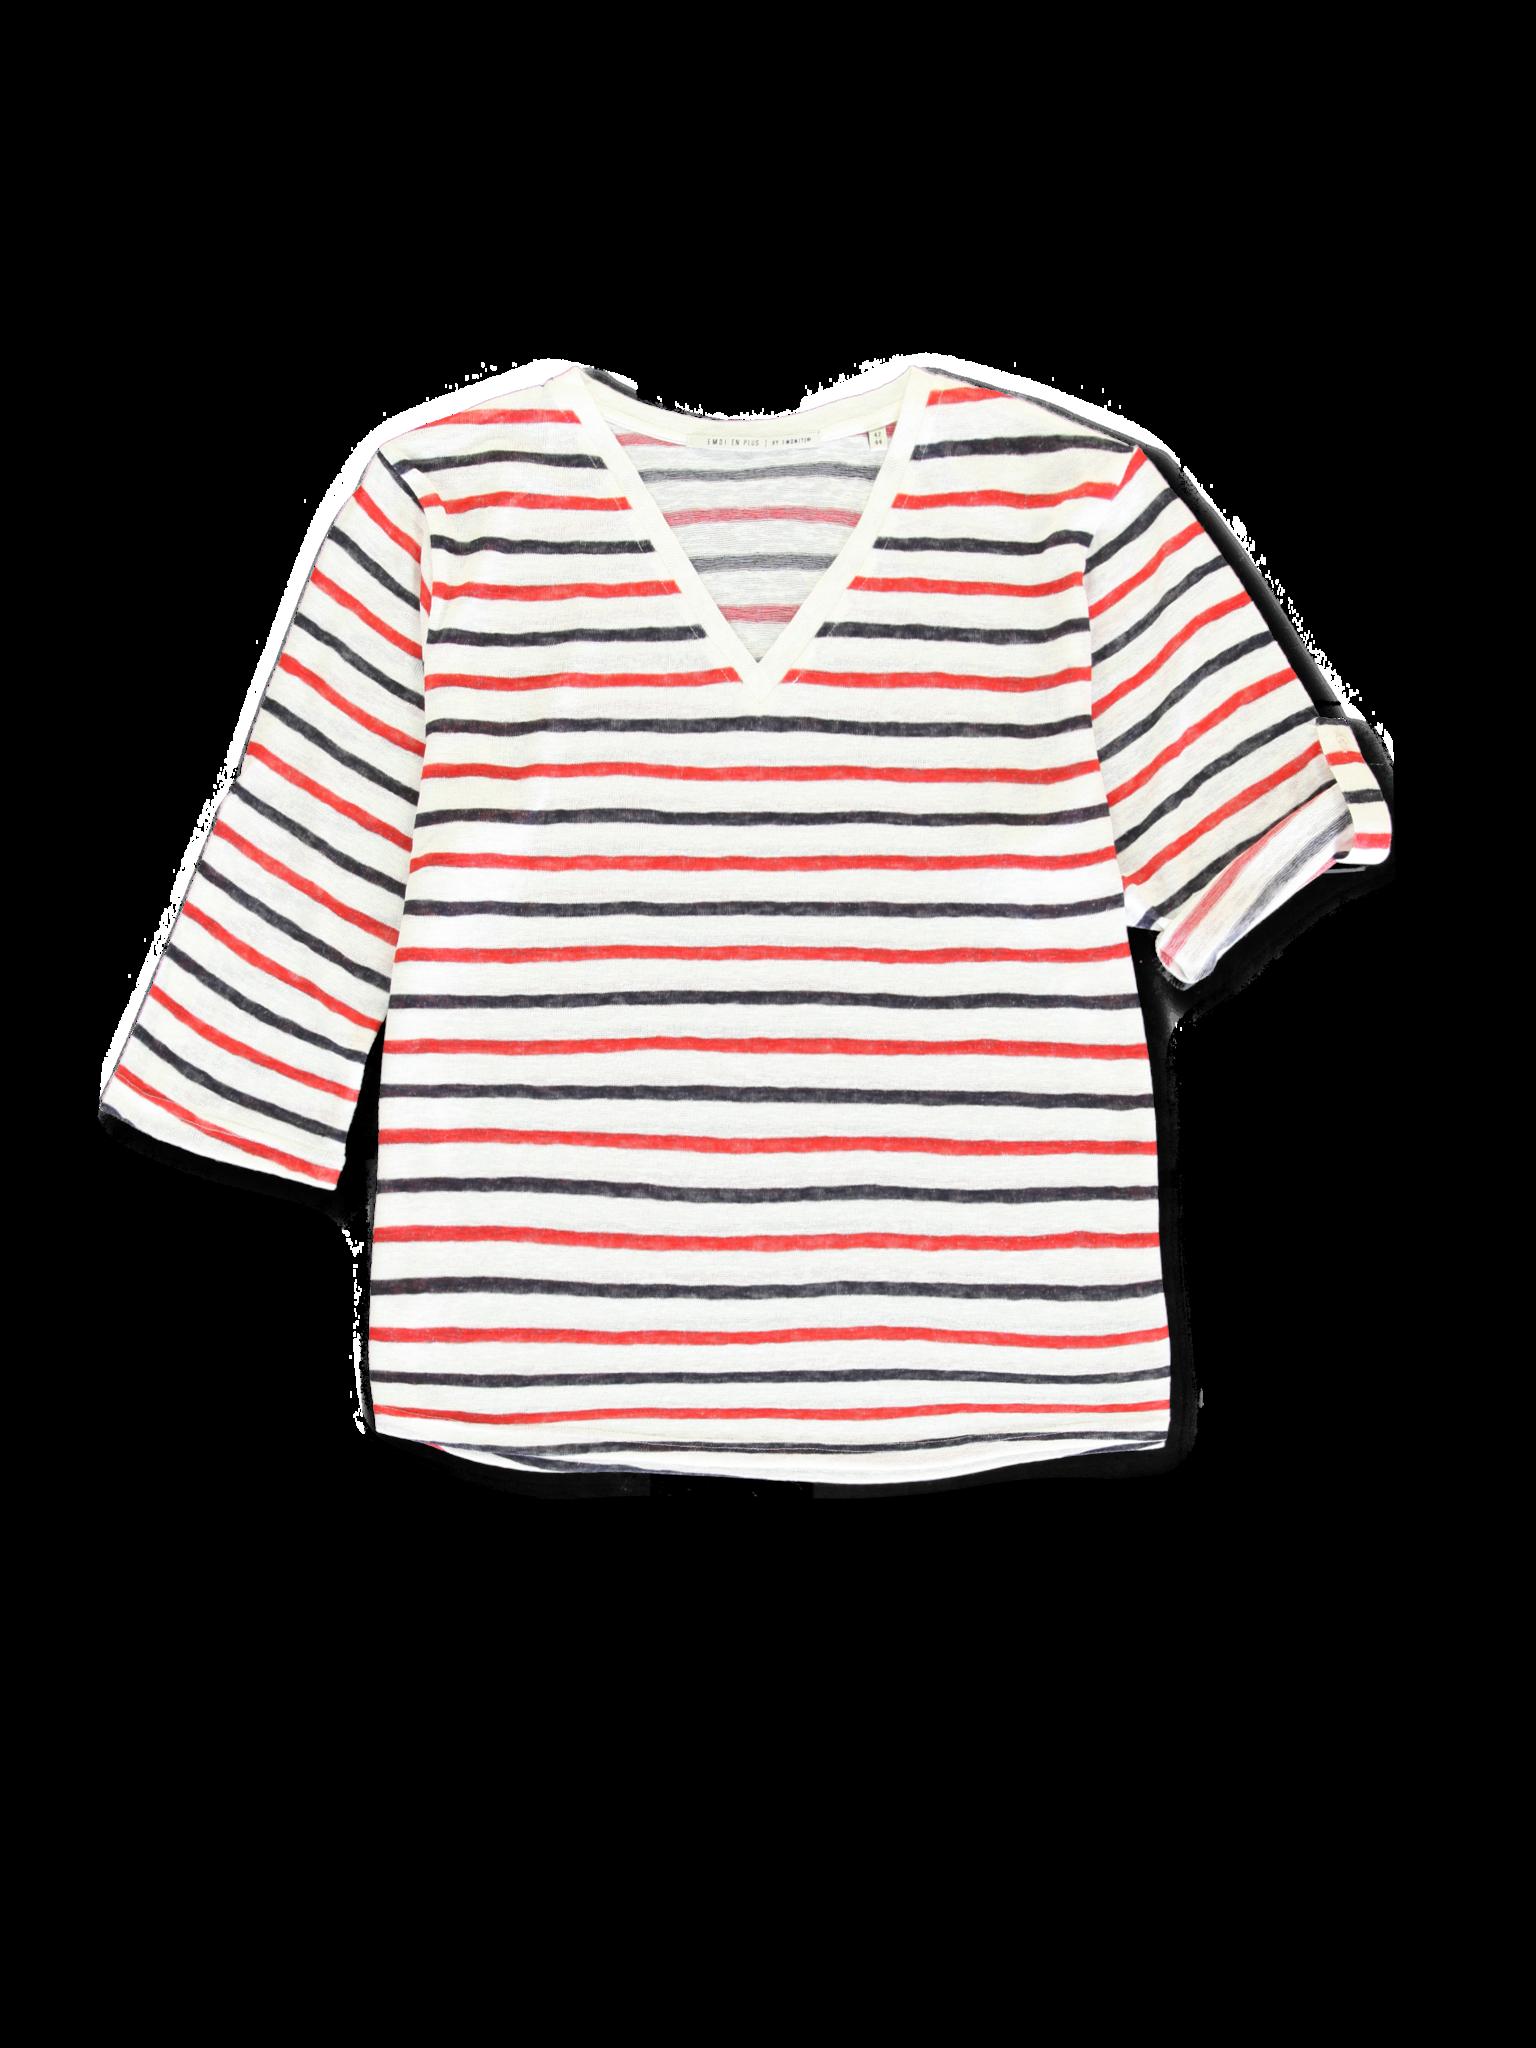 Emoi | Summer 2020 Ladies+ | T-shirt | 18 pcs/box